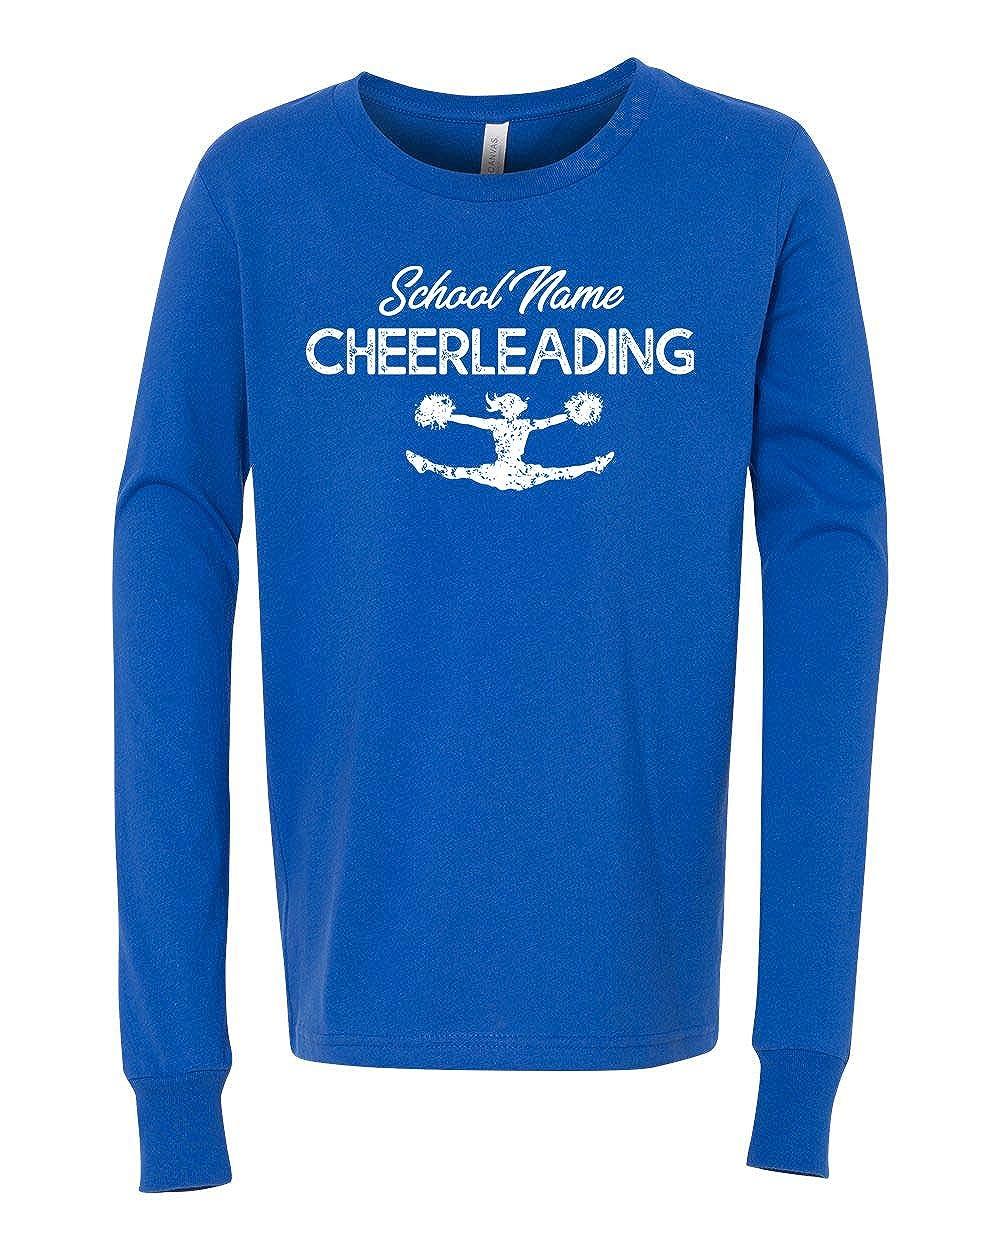 Custom Cheer School Name Girls Boys Long Sleeve